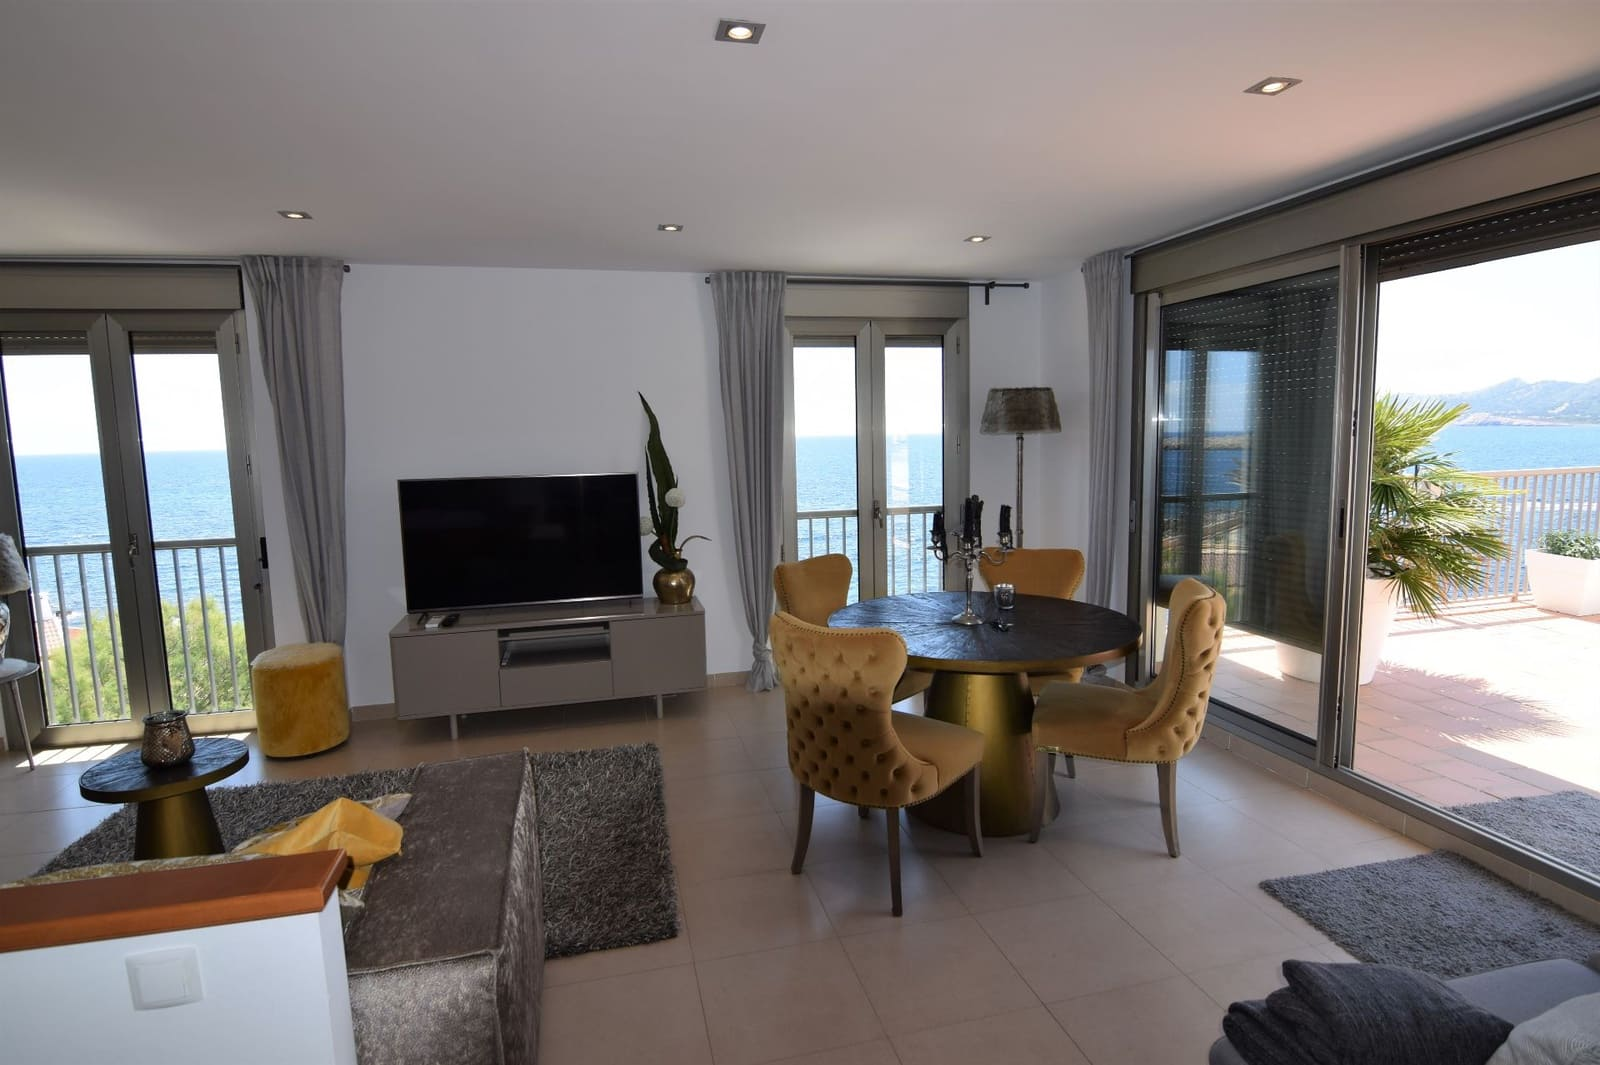 3 sovrum Takvåning att hyra i Cala Ratjada - 2 600 € (Ref: 5360302)